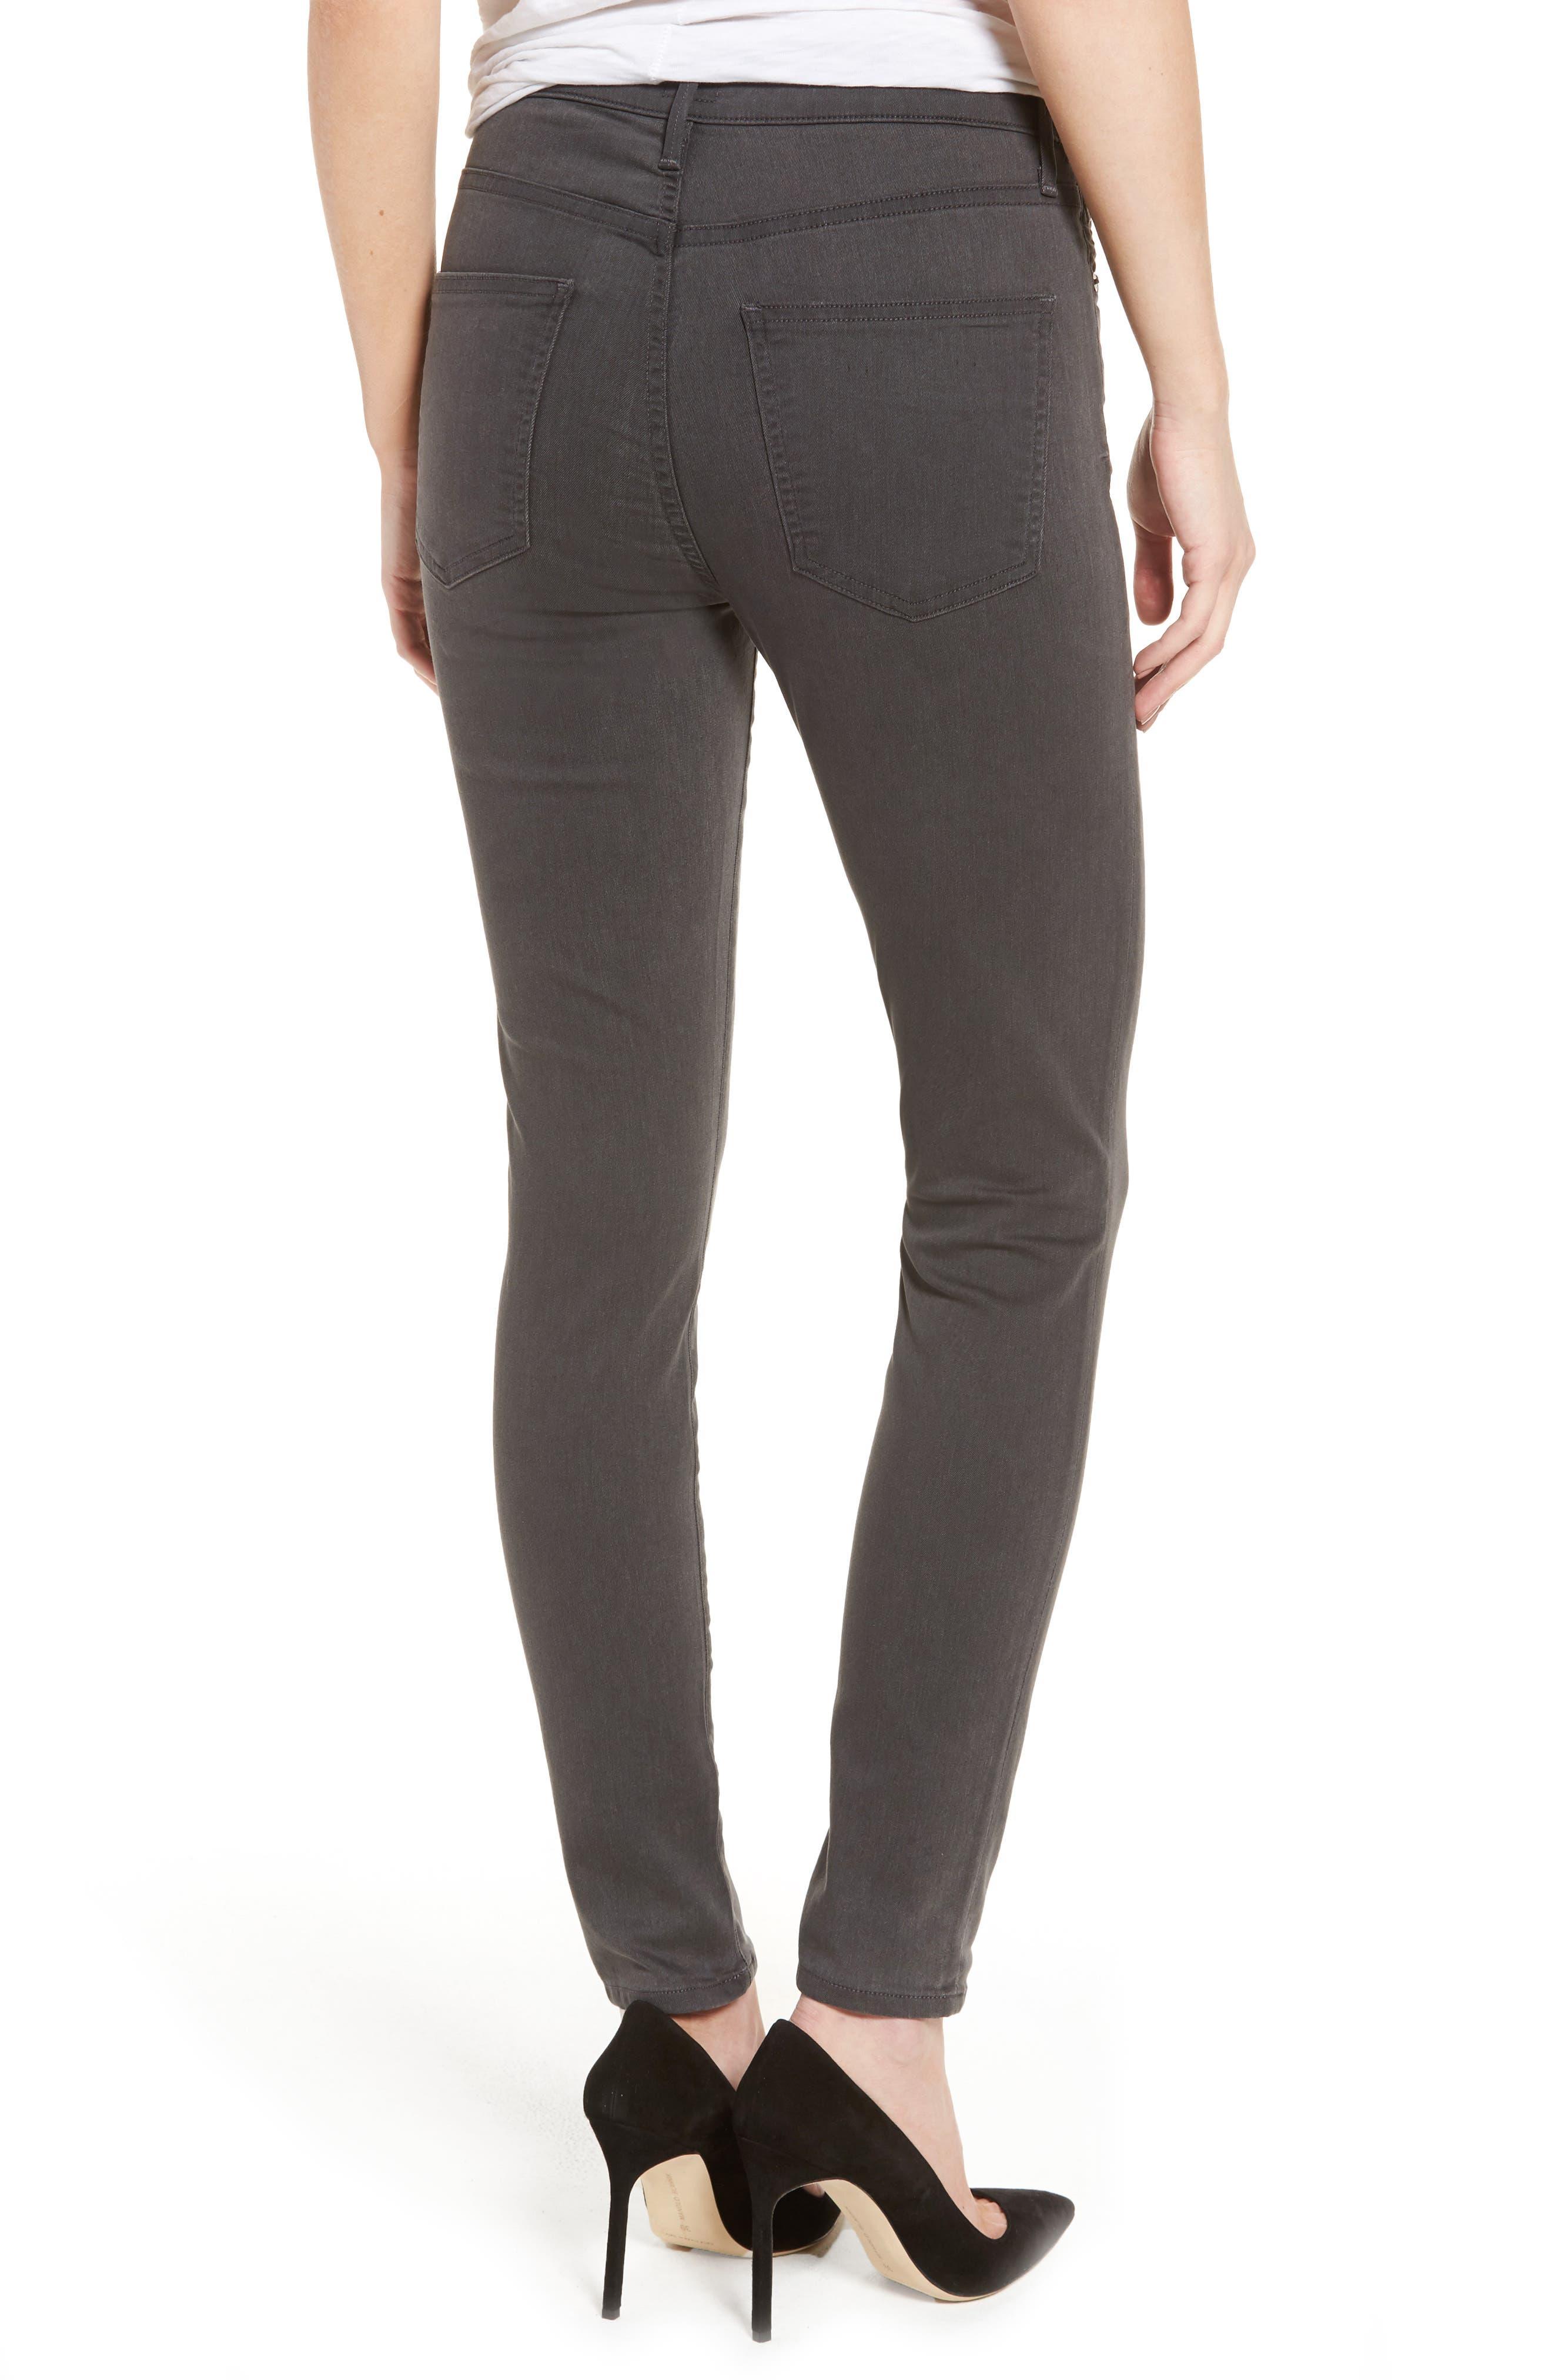 Rocket Petite High Waist Skinny Jeans,                             Alternate thumbnail 2, color,                             034